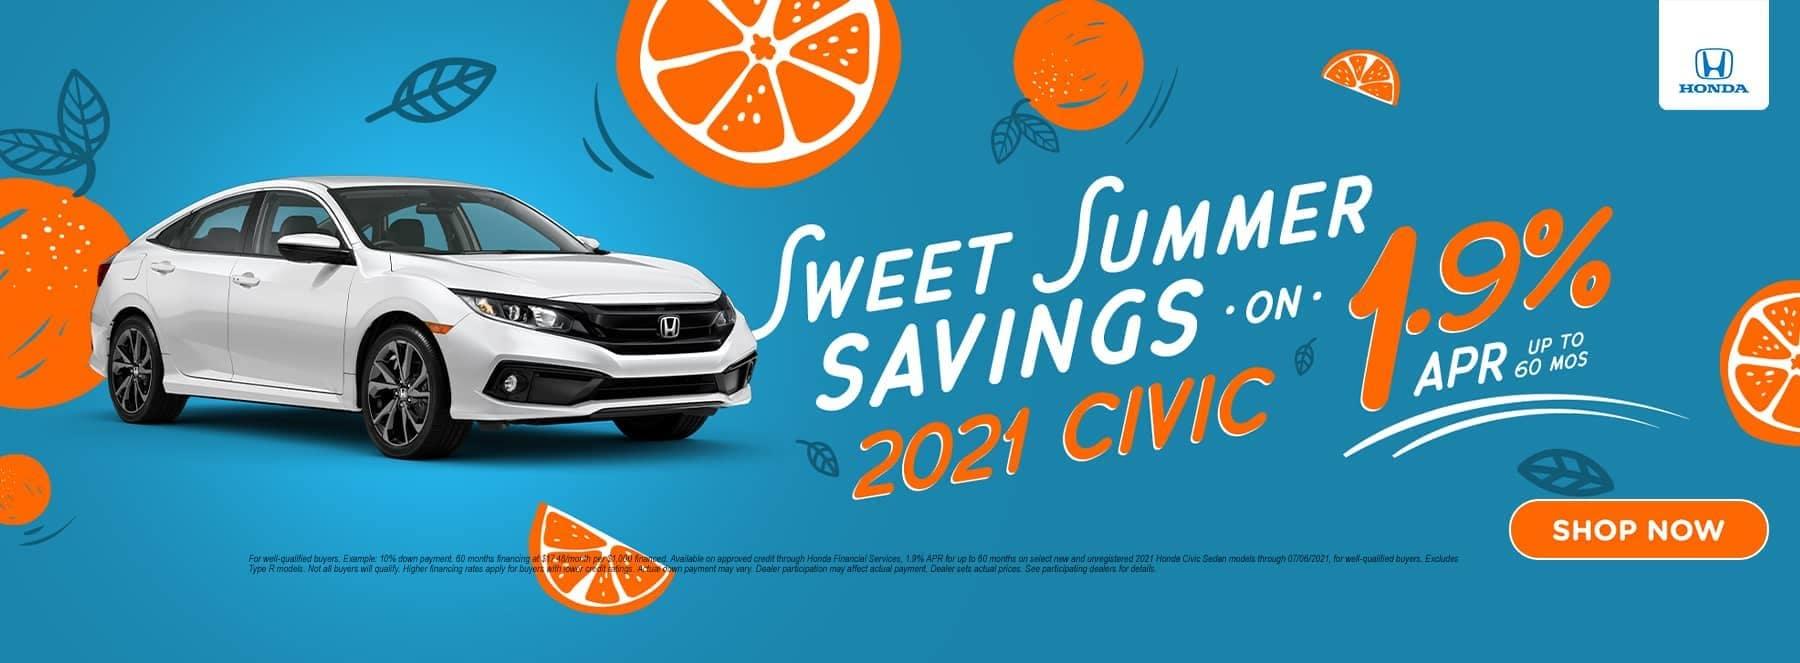 Sweet Summer Savings 2021 Civic